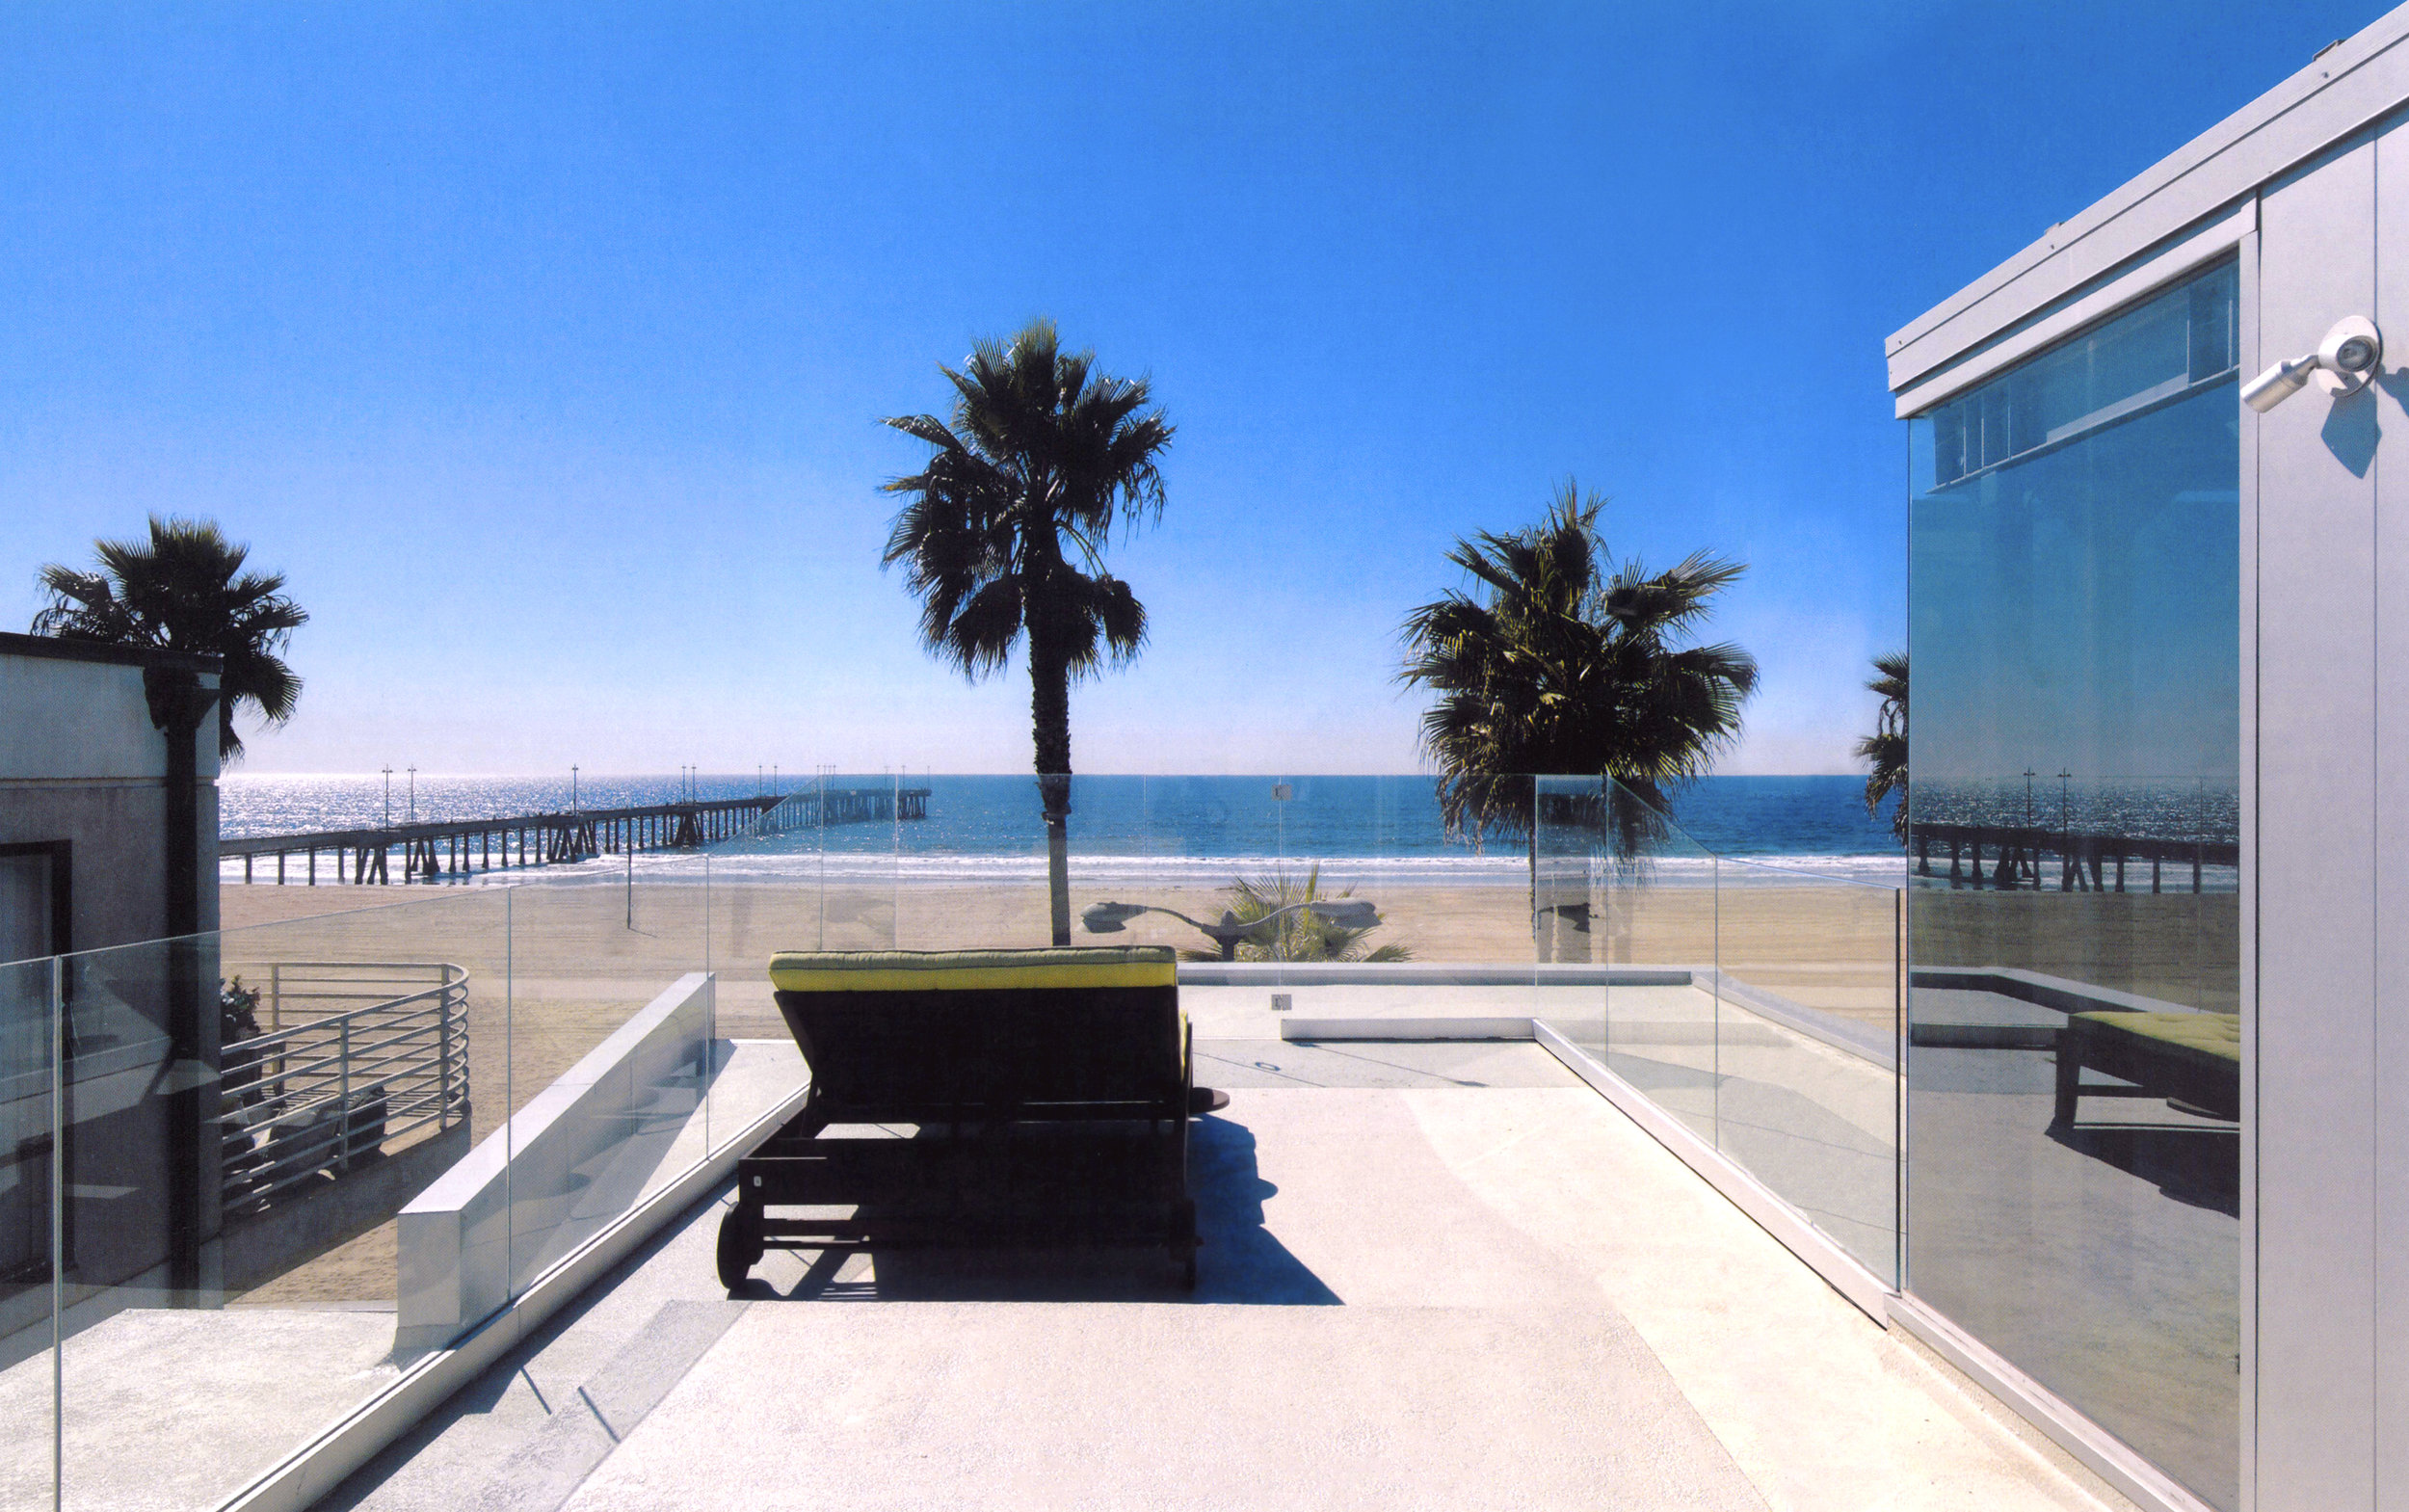 S.E.A.-Studio-Environmental-Architecture-David-Hertz-FAIA-Panel-House-Venice-Beach-California-sustainable-regenerative-restorative-green-design-prefabricated-aluminum-refrigeration-open-concept-ocean-view-residential-glass-steel-sunset-exterior-9.jpg